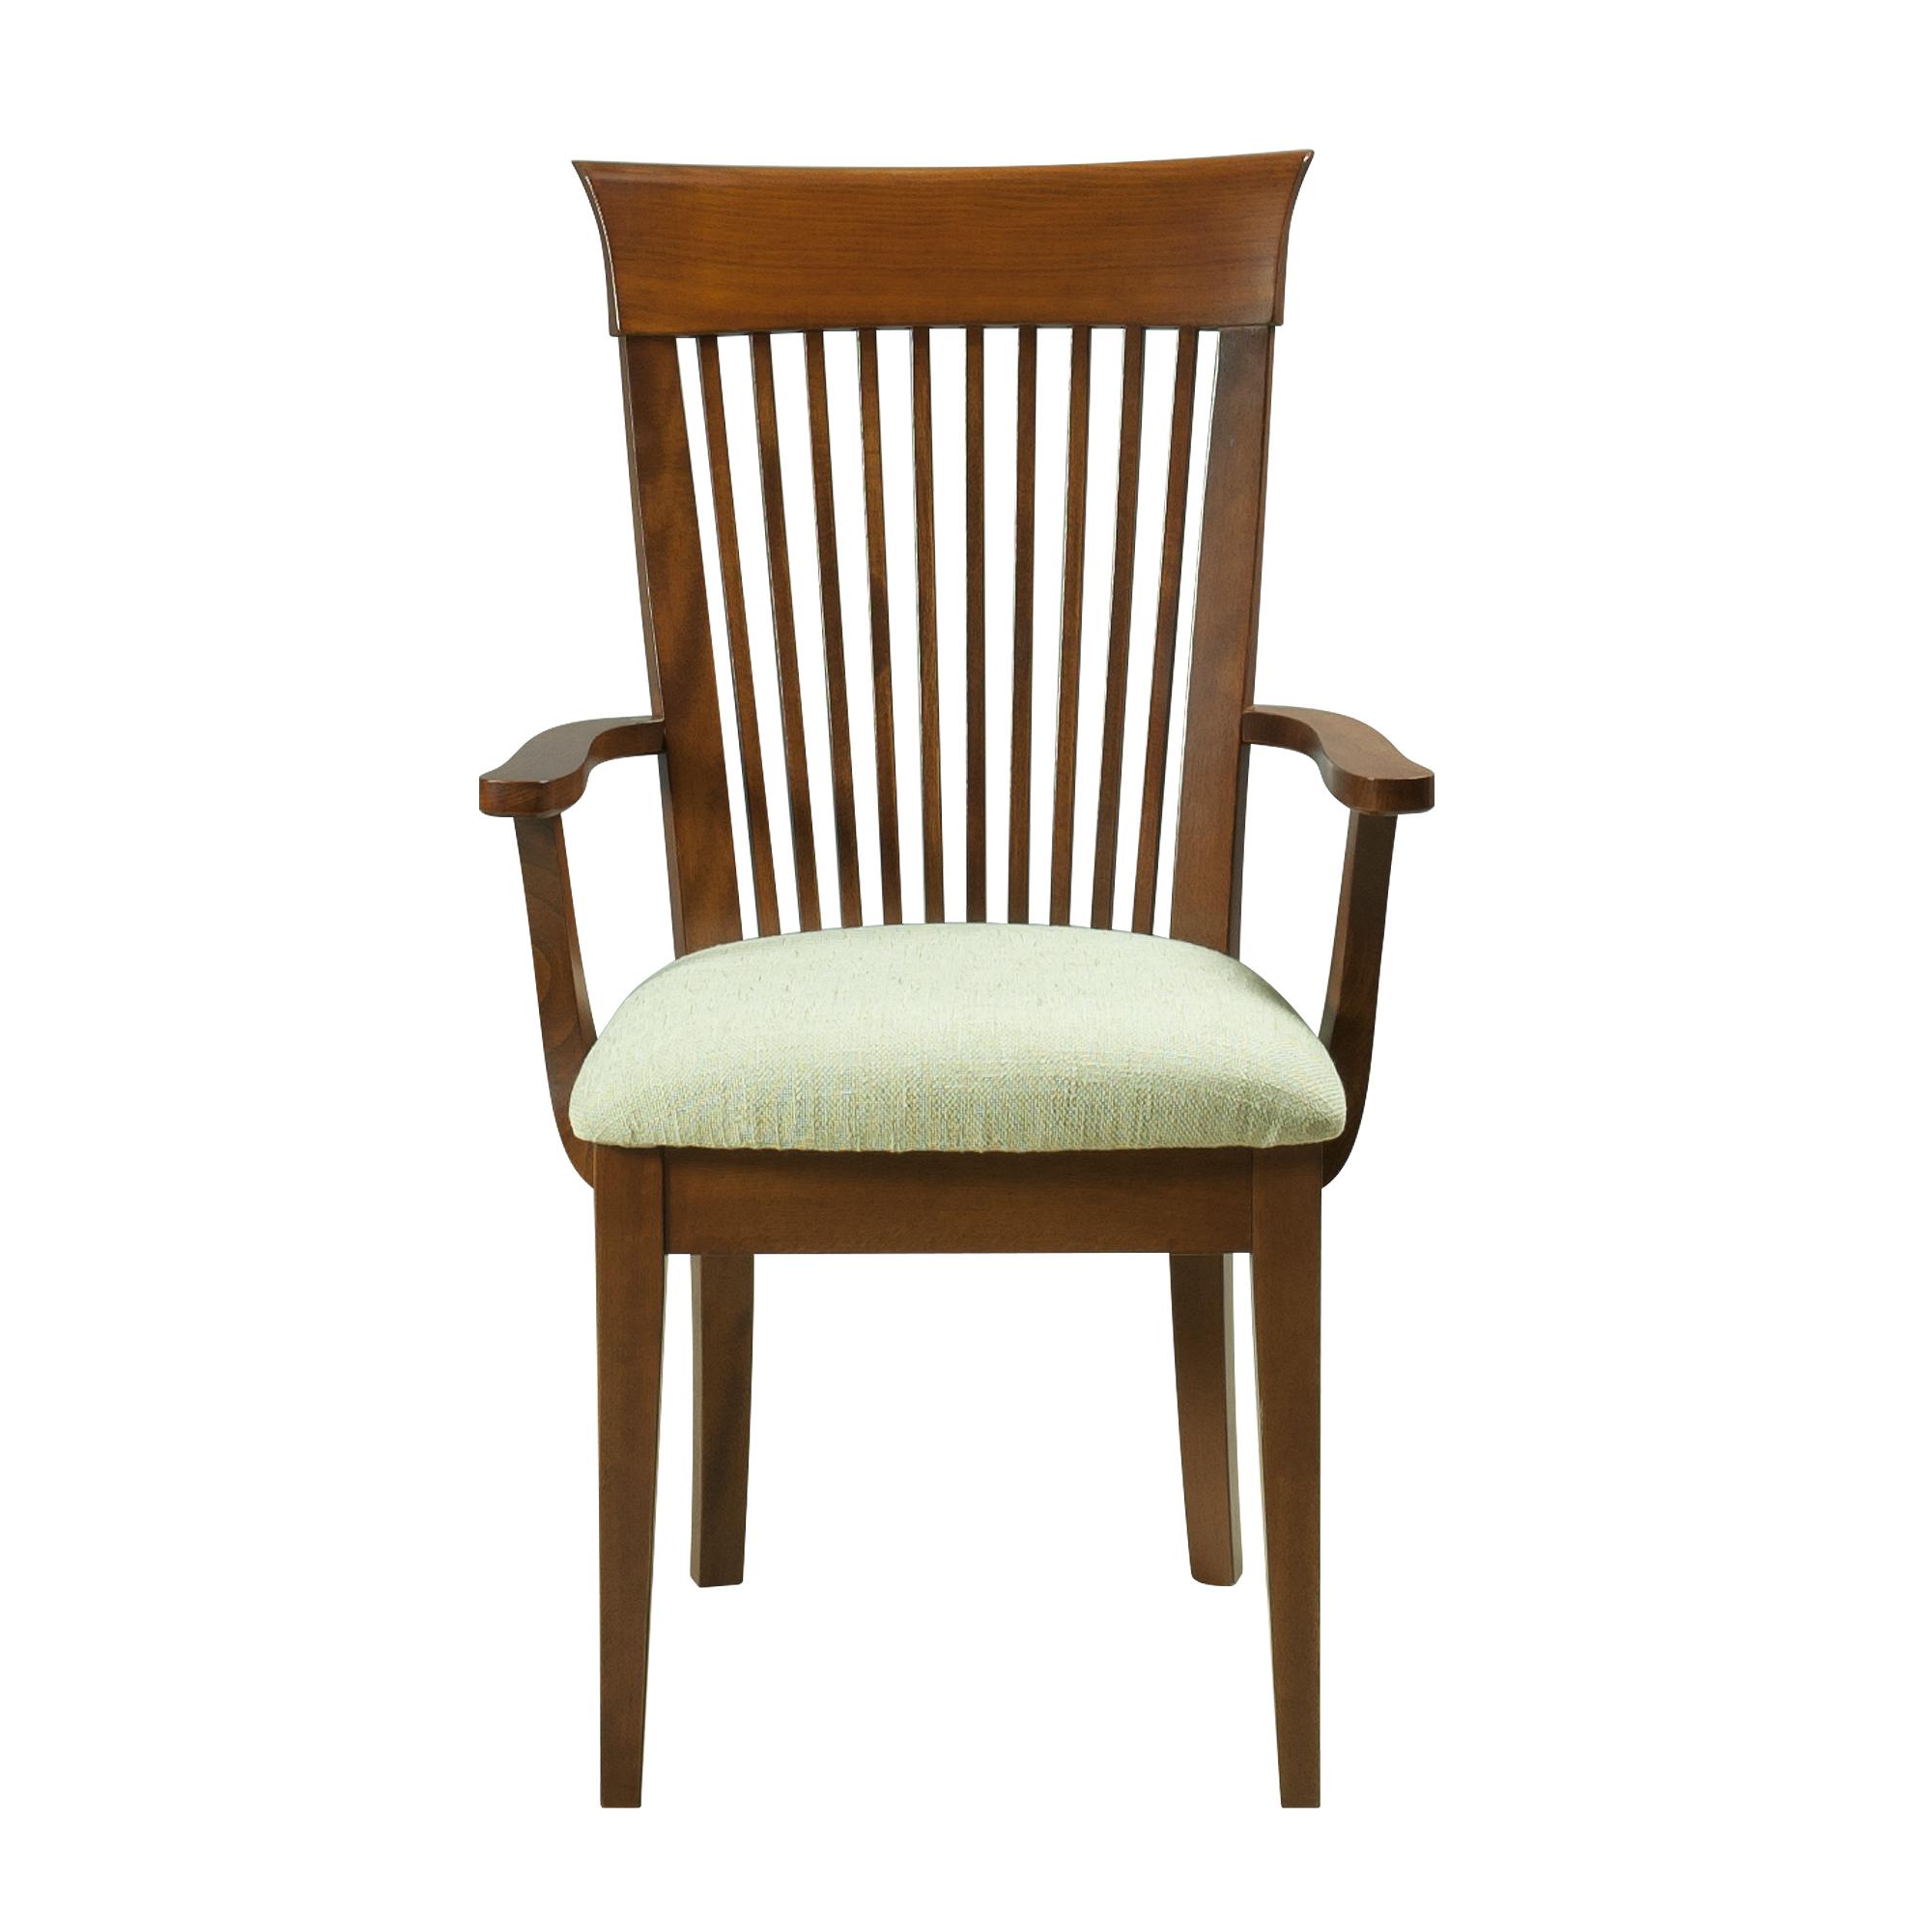 Model 58 Arm Chair Upholstered